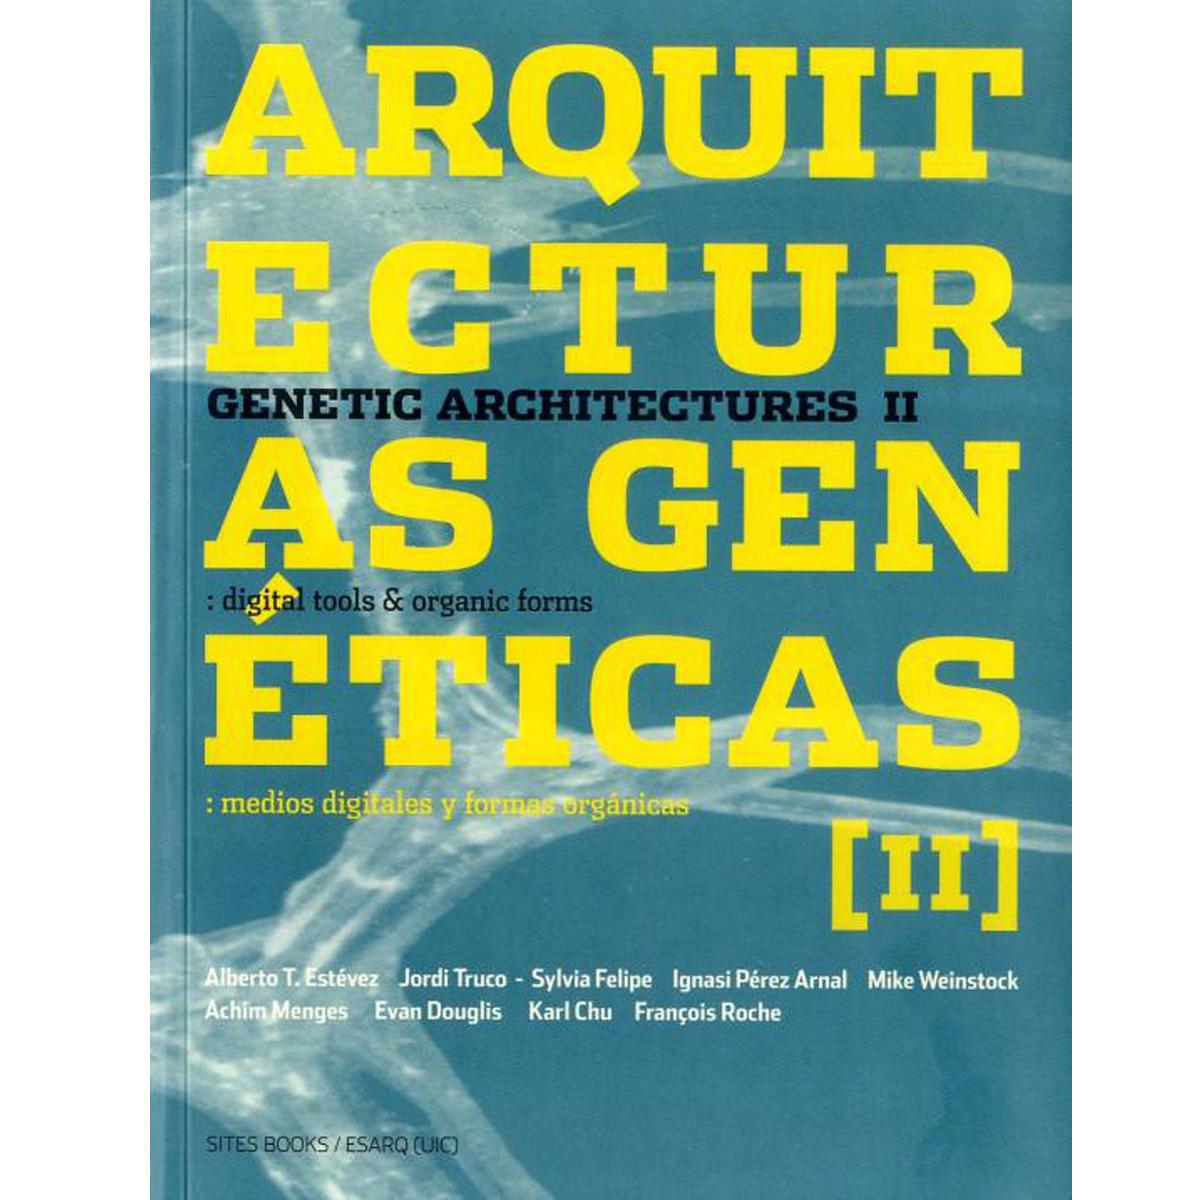 Arquitecturas genéticas [II]